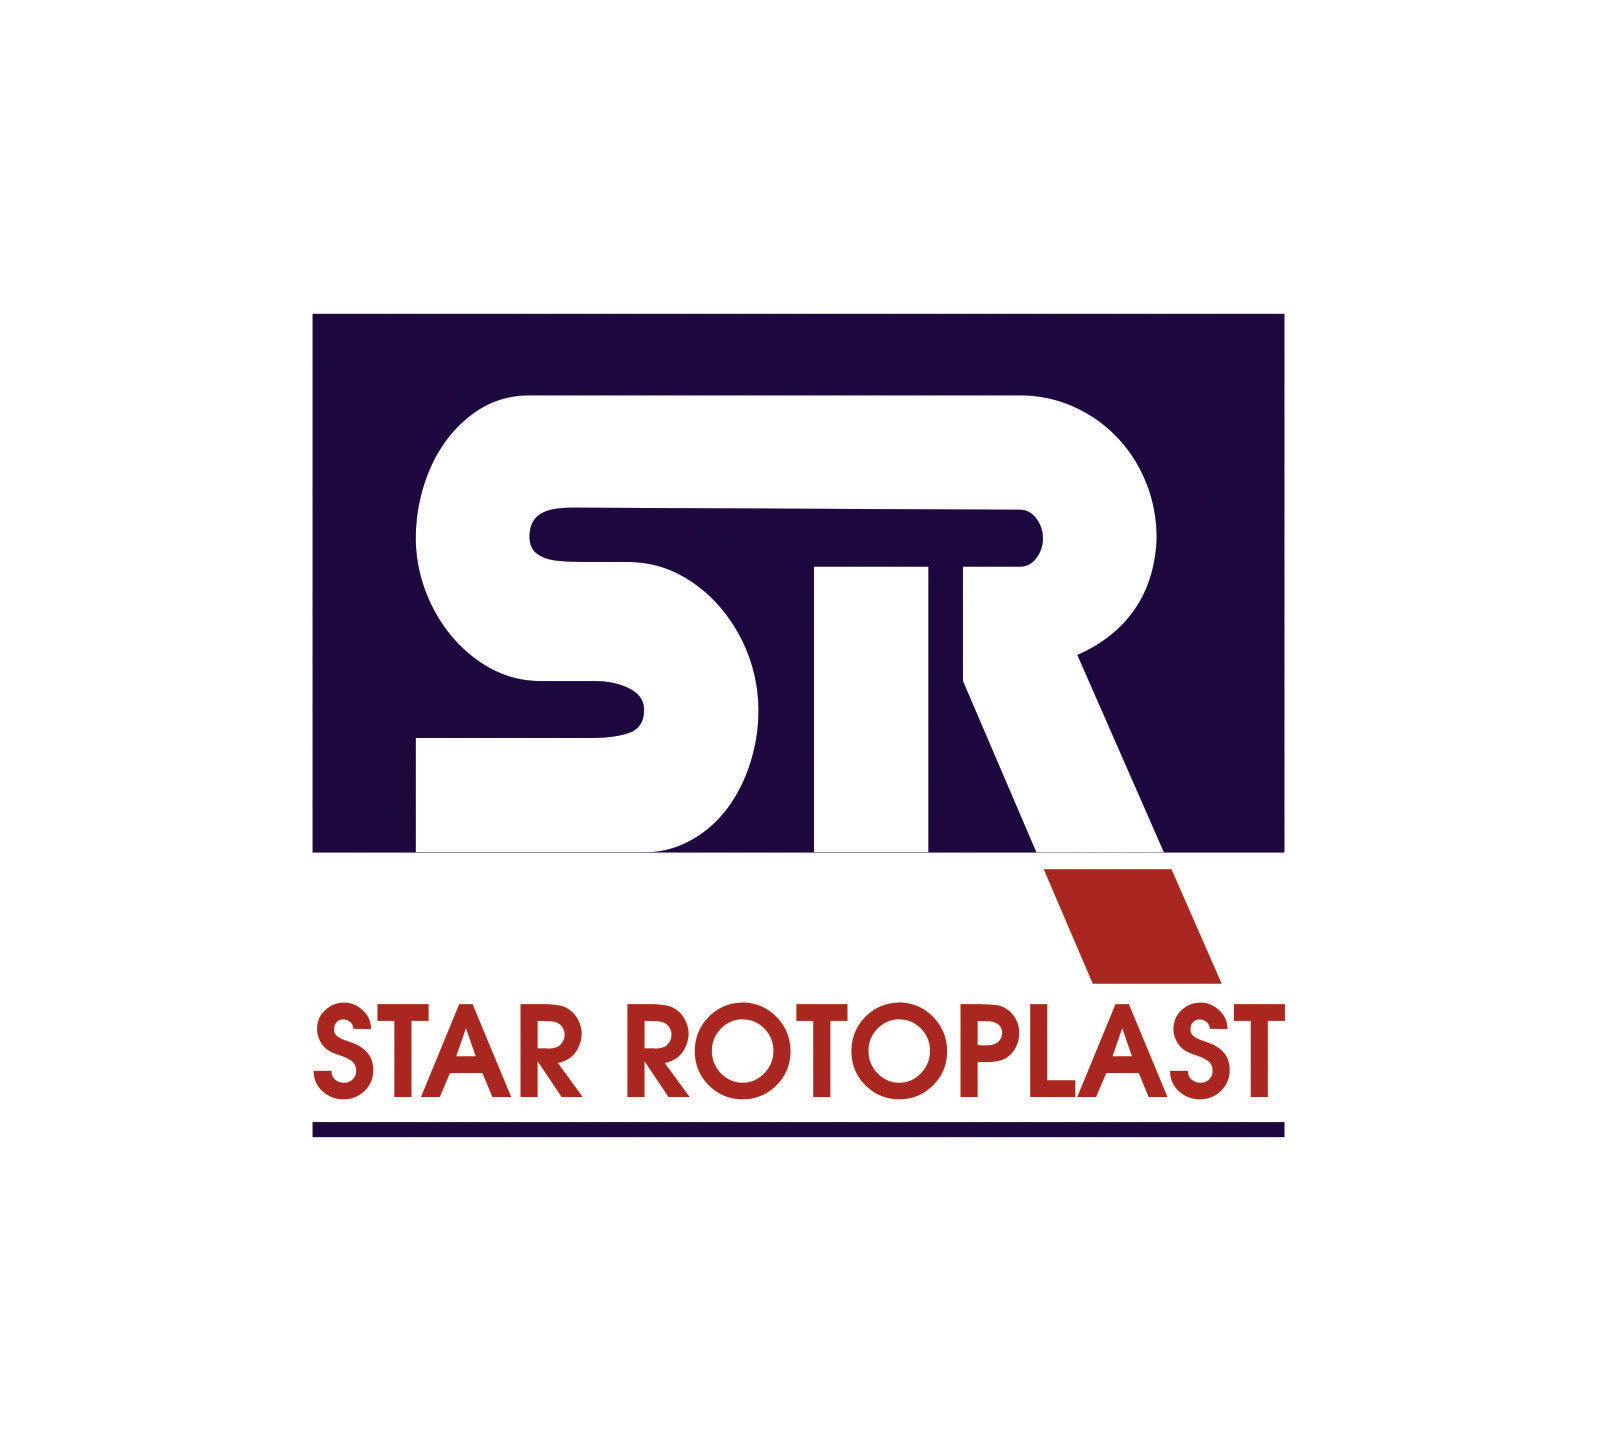 Star Rotoplast